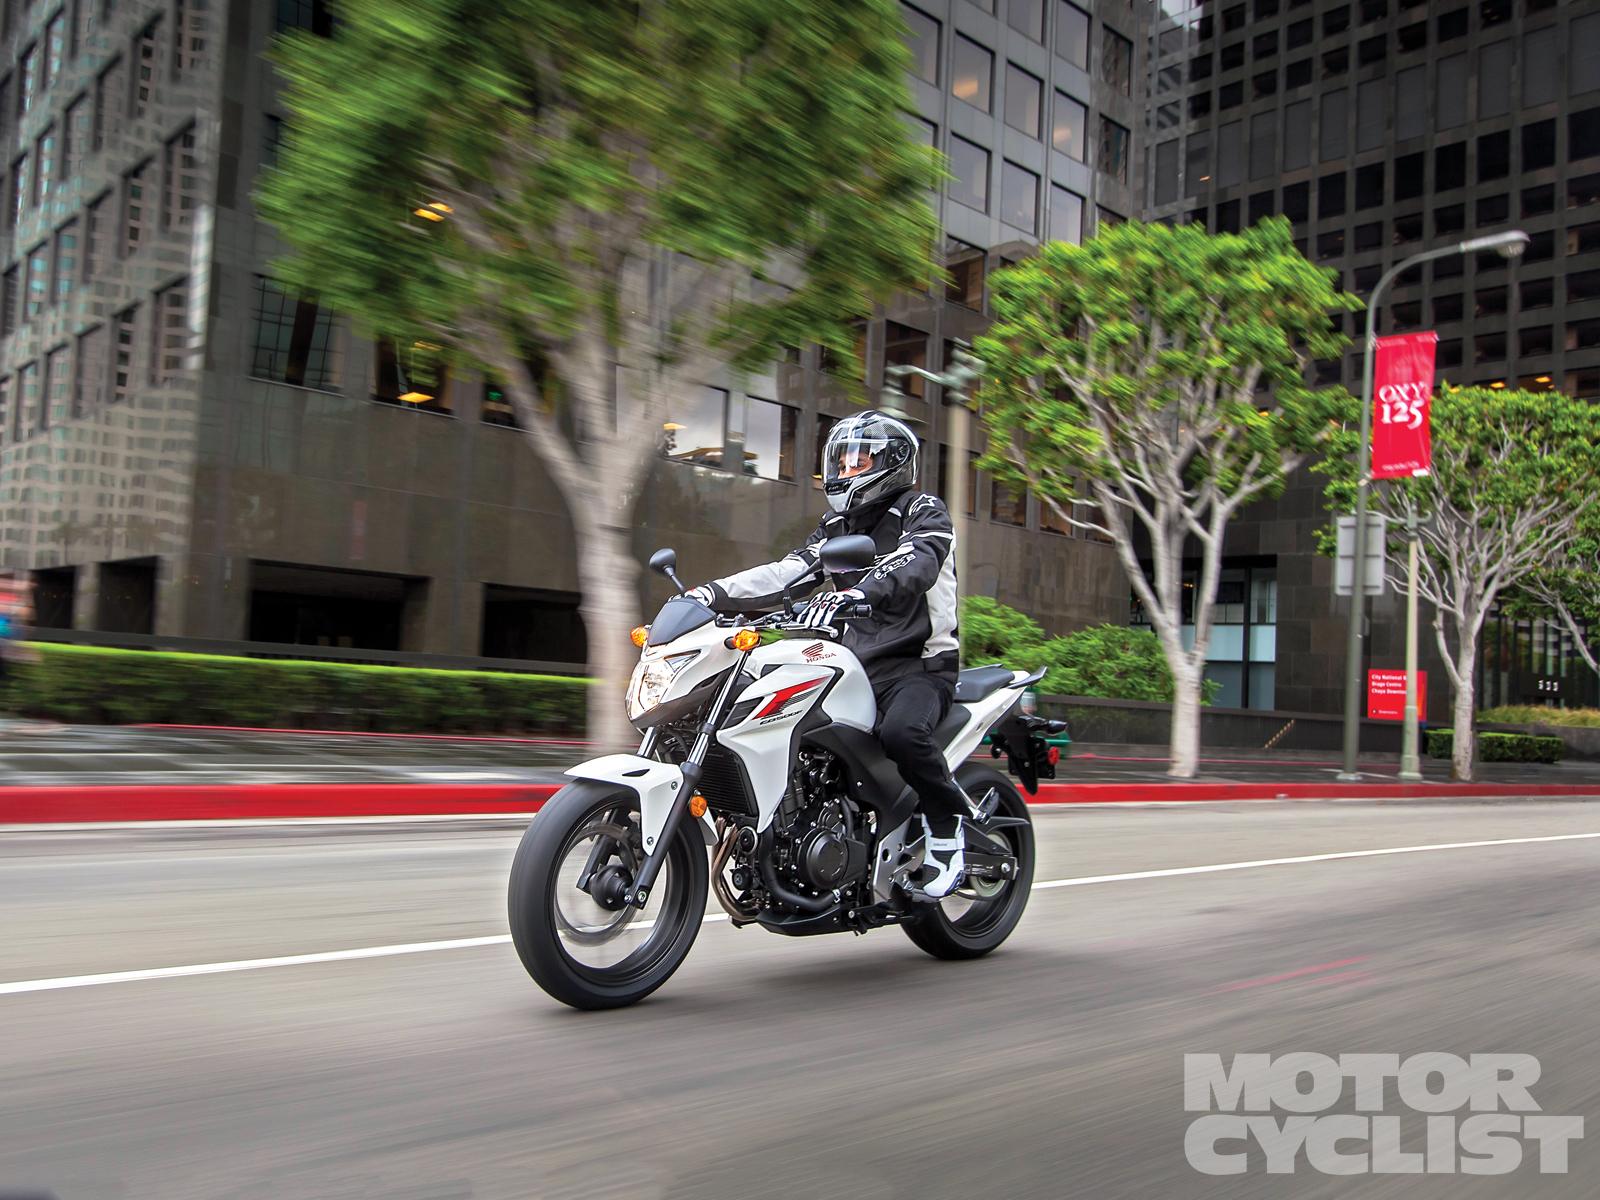 Test Drive A Motorcycle New Honda CB 500 F